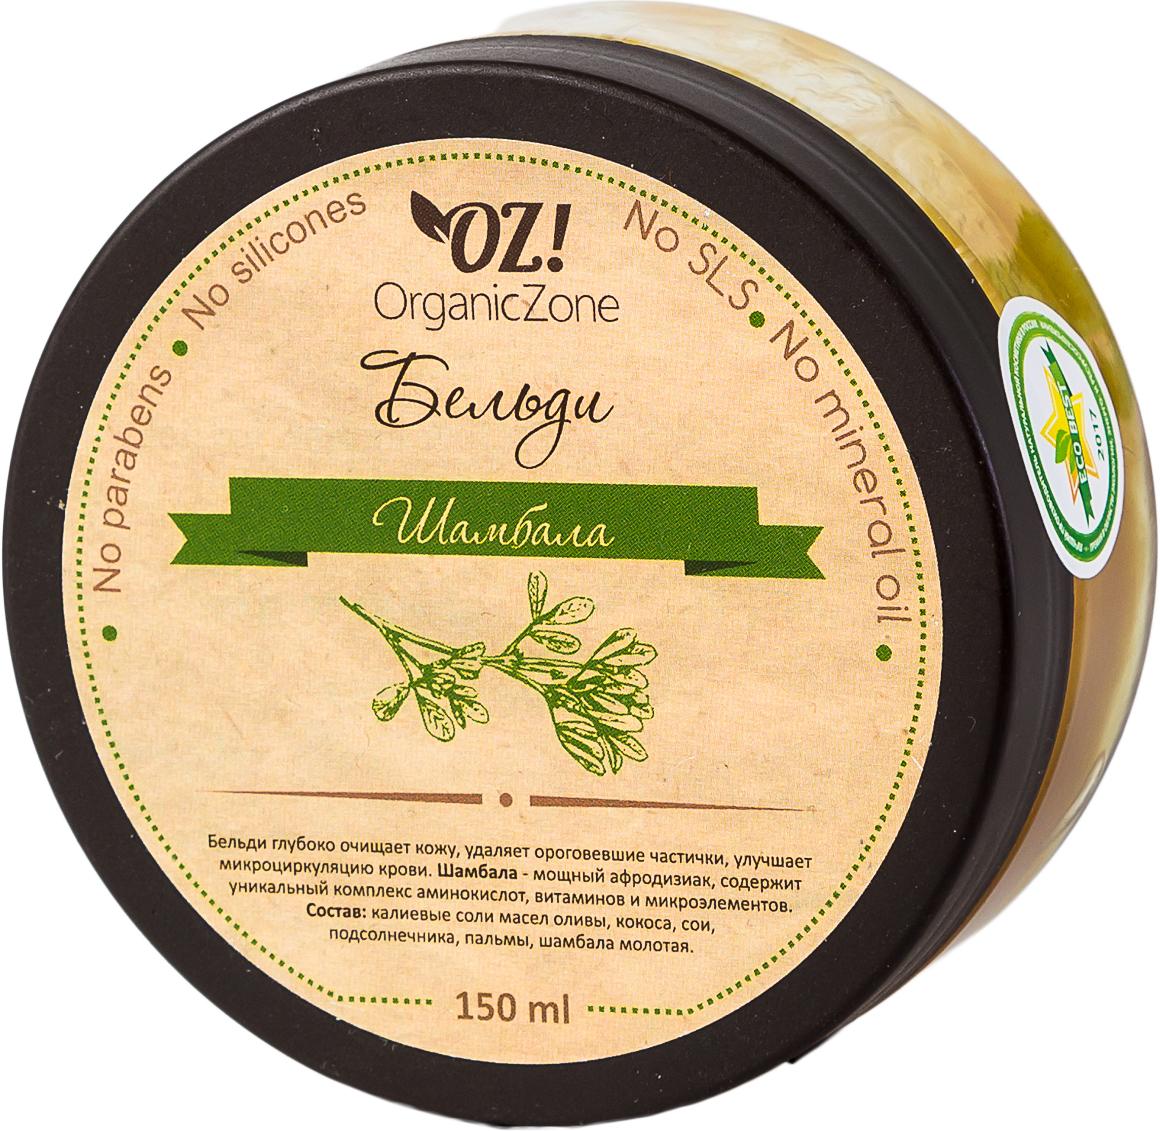 OrganicZone Бельди Шамбала, 150 мл дезодоранты organiczone дезодорант